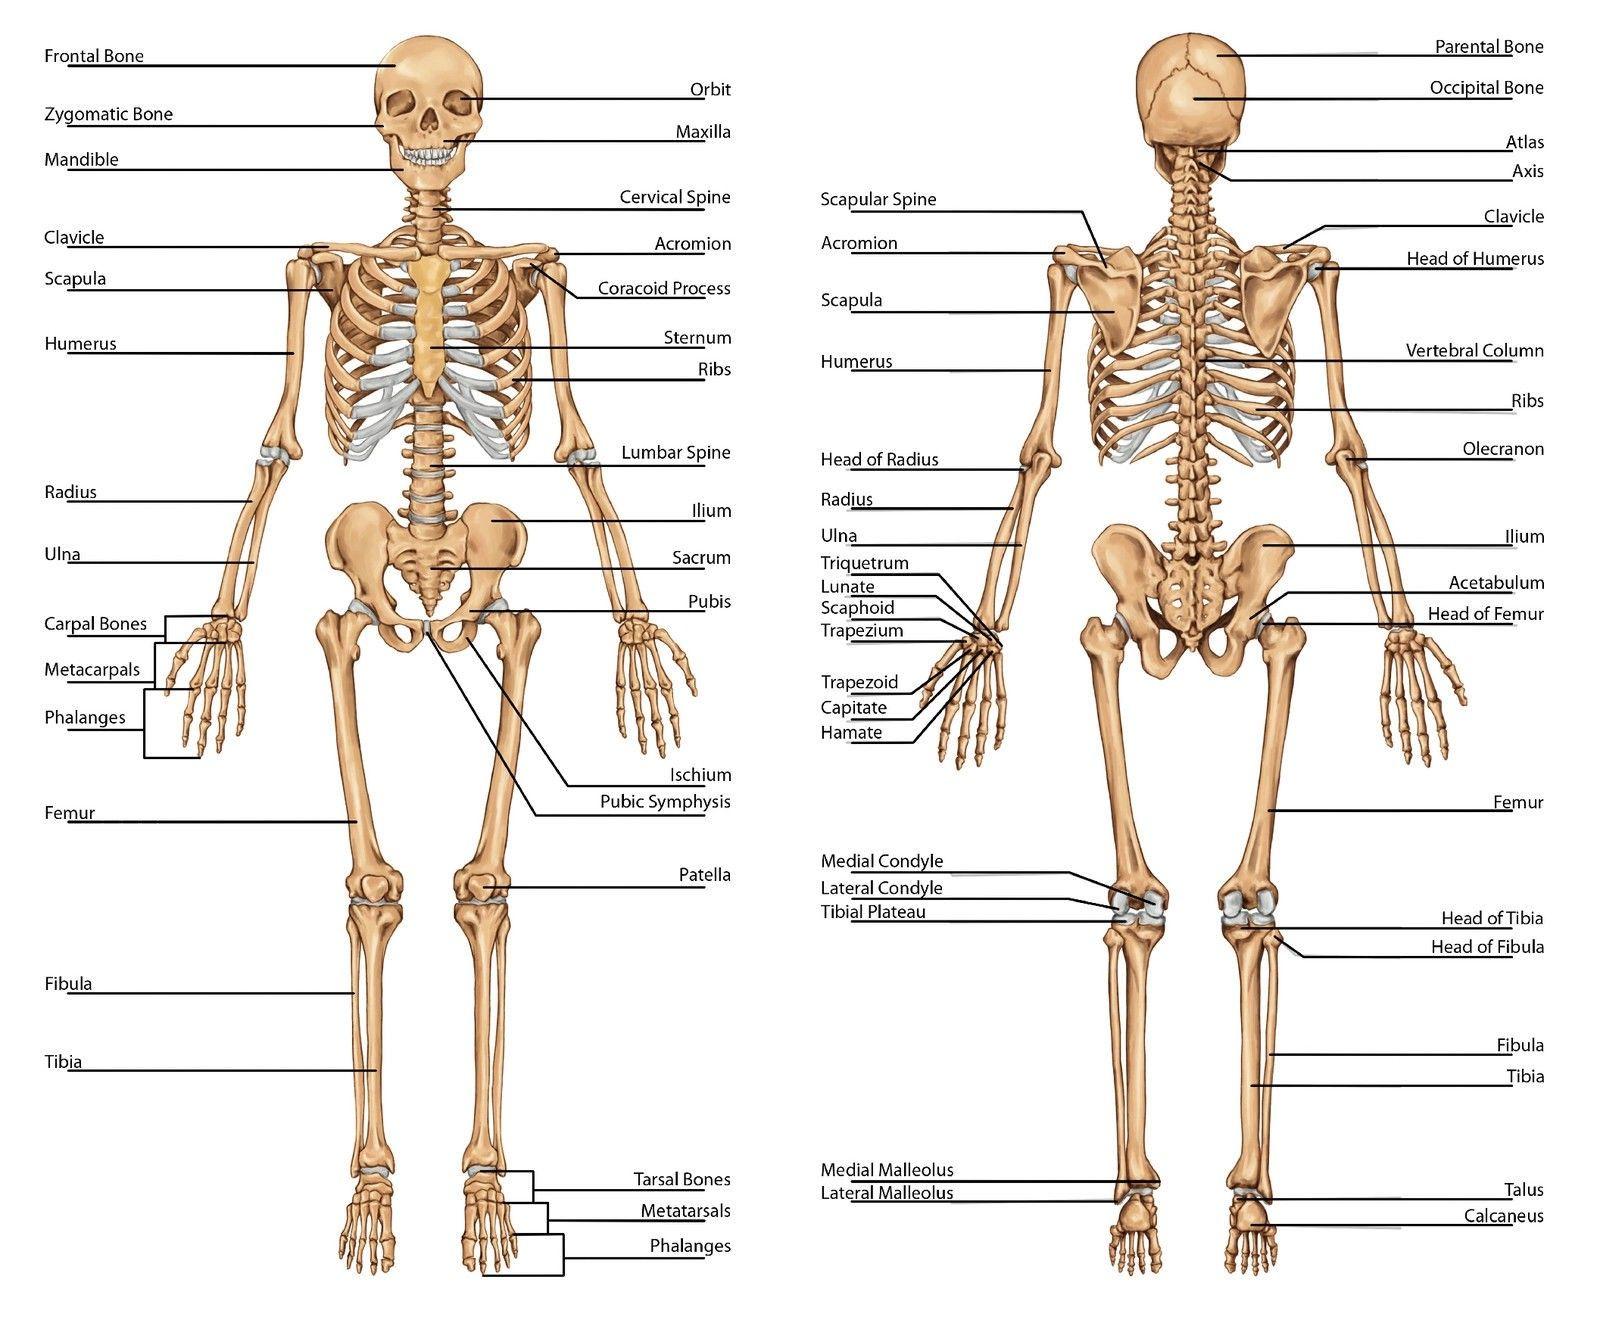 small resolution of diagram of the human body skeleton inspirational skeleton anatomy rh pinterest fr human skeleton diagram human bone structure diagram